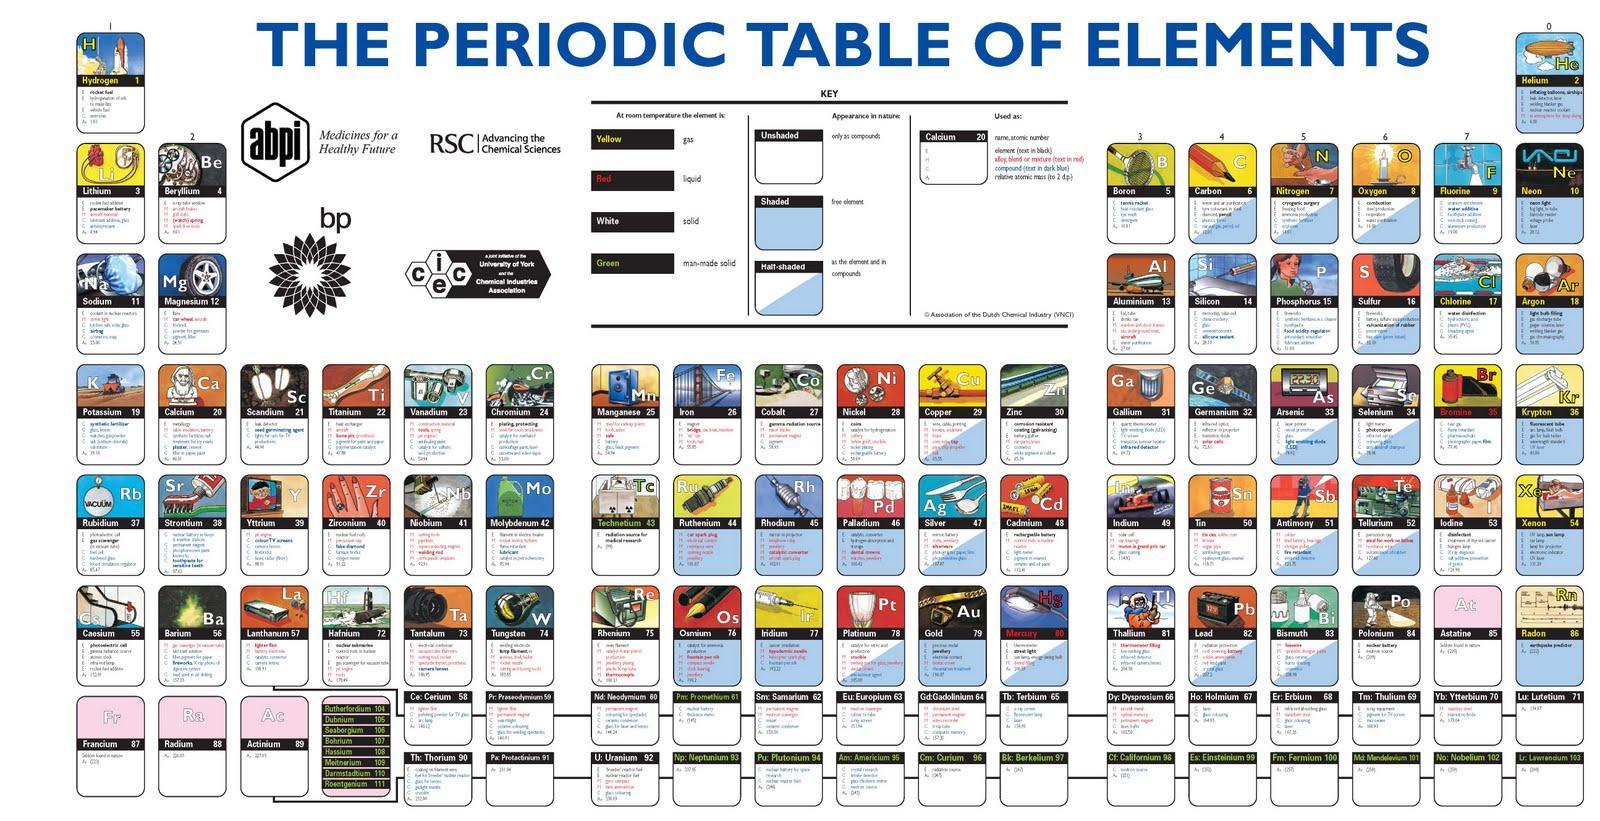 tabel periodik dengan berkarakter superhero - Tabel Periodik Ukuran Besar